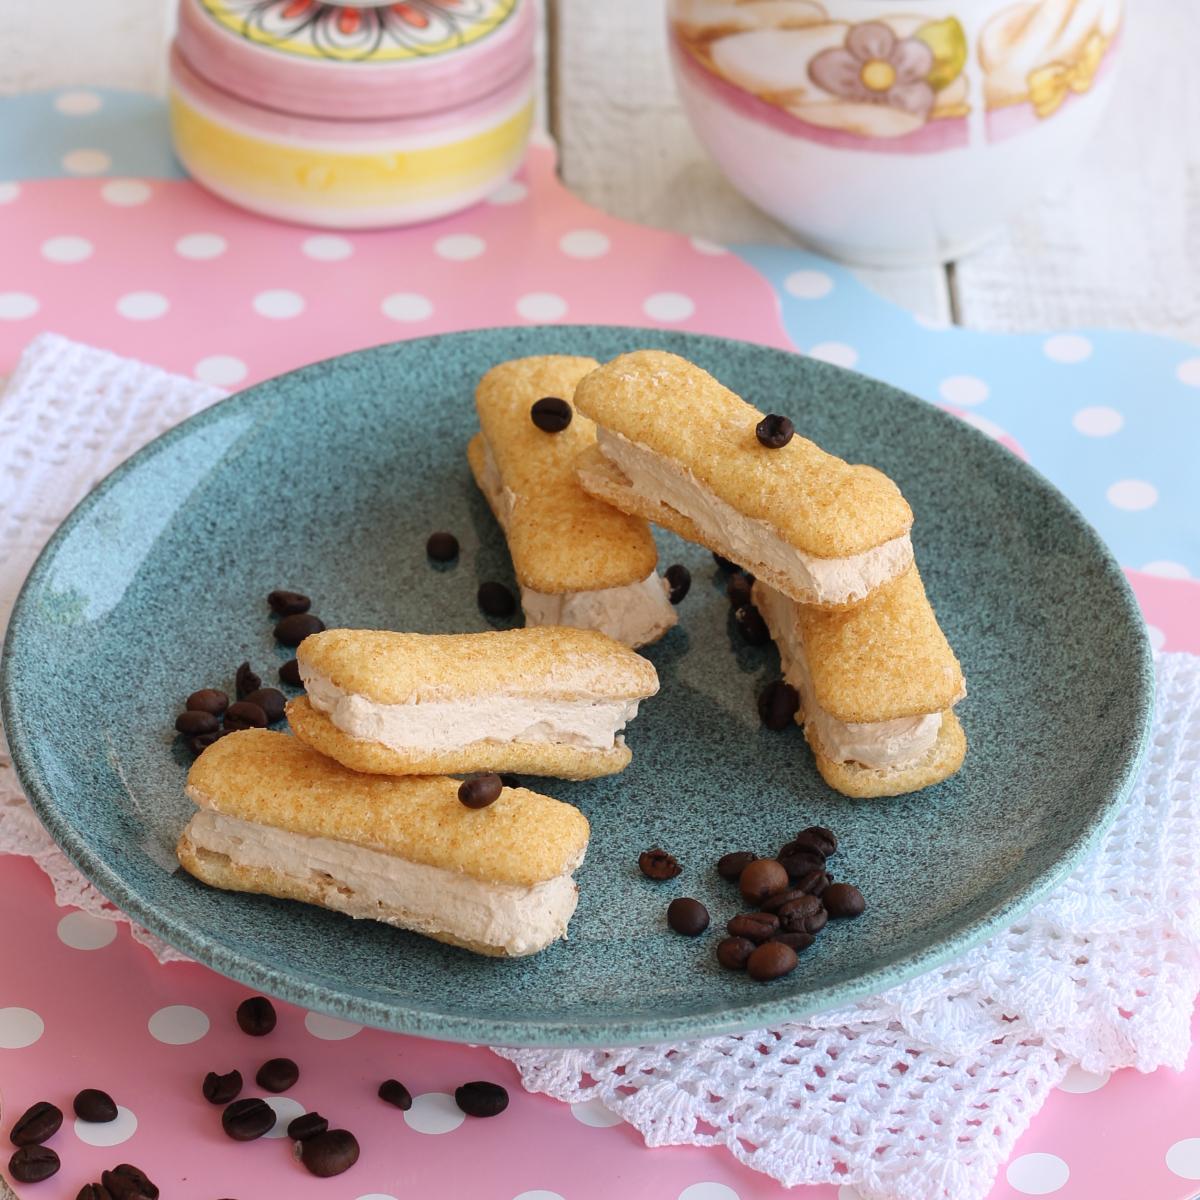 RICETTA PAVESINI GELATO AL CAFFE' gelato furbissimo senza gelatiera